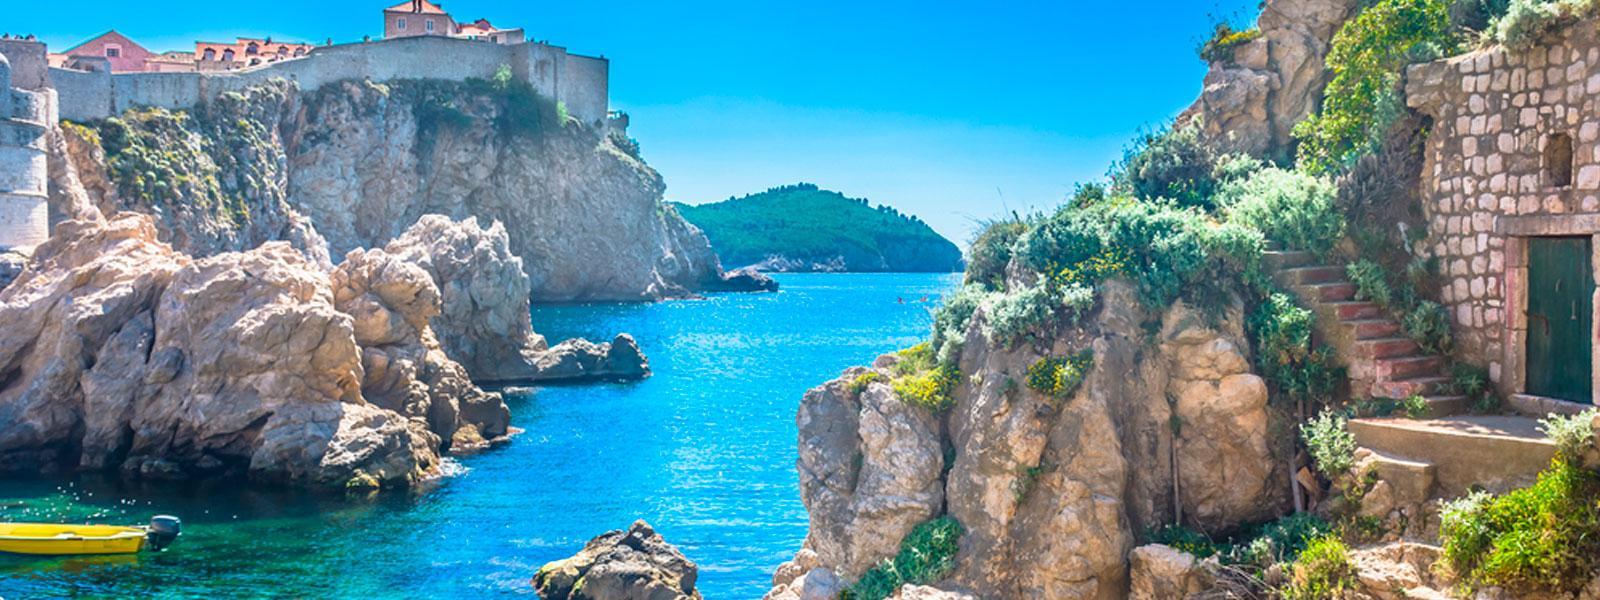 Blue sea - Croatia honeymoon